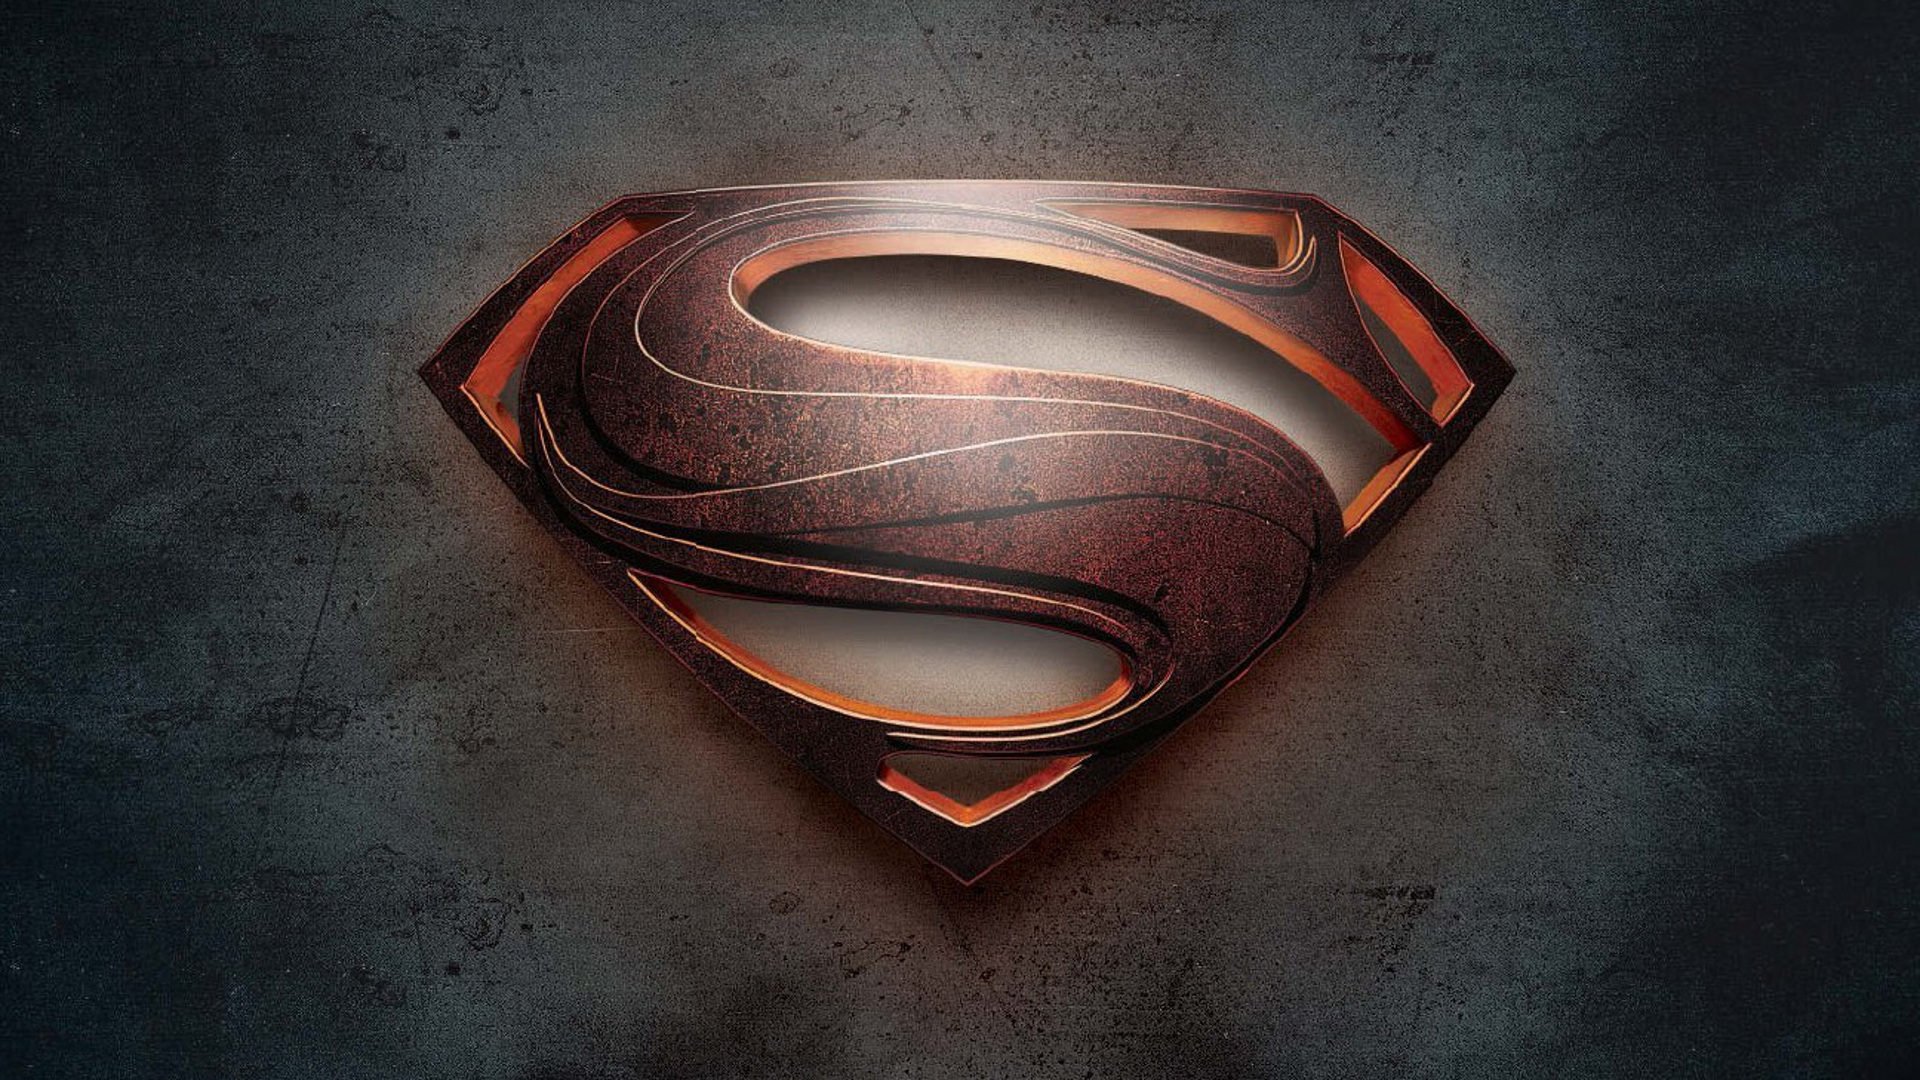 Man of Steel Superman Wallpapers HD Wallpapers 1920x1080